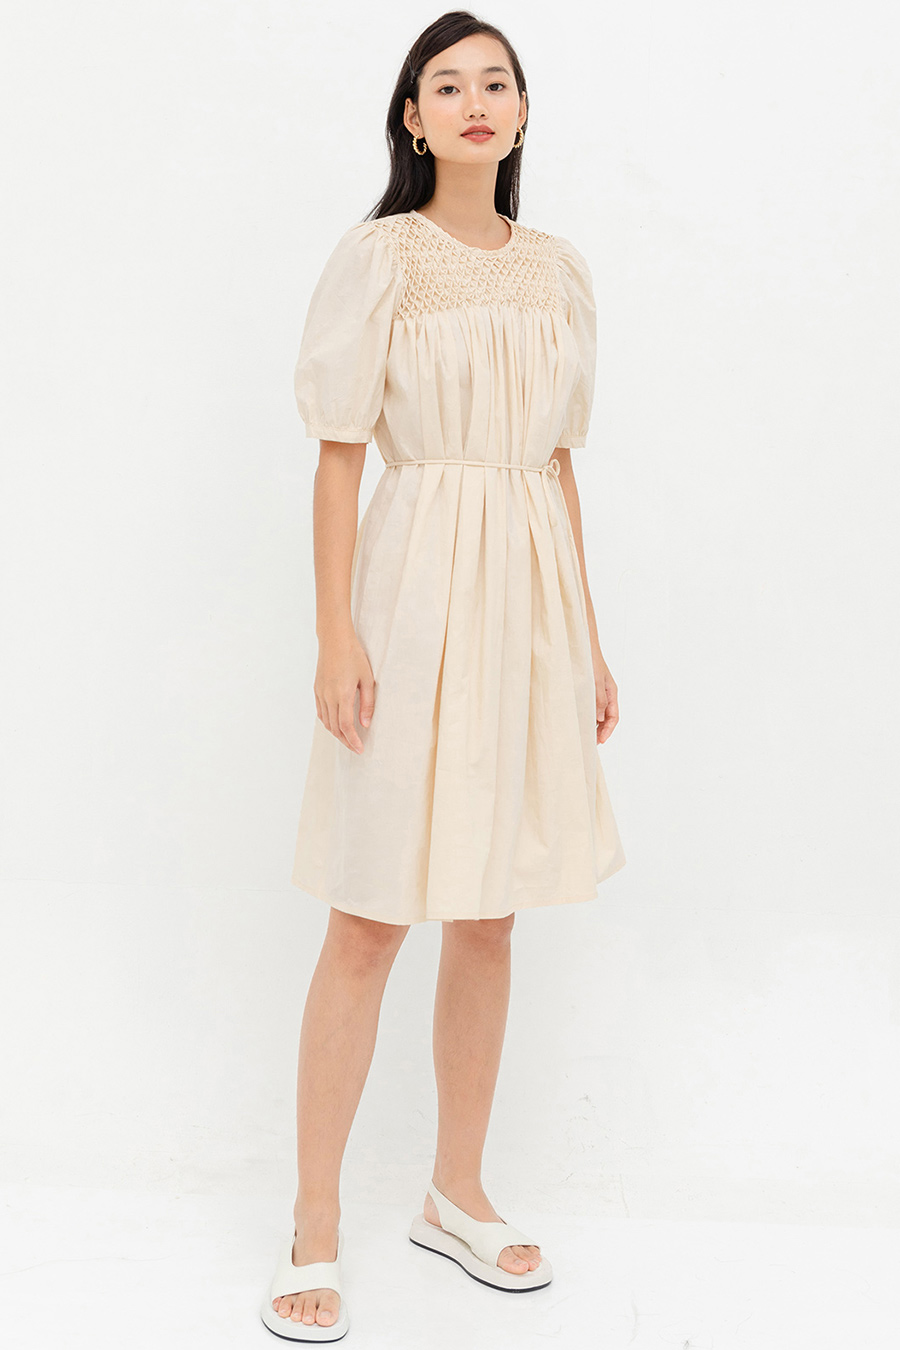 VALERIAN DRESS - SAND